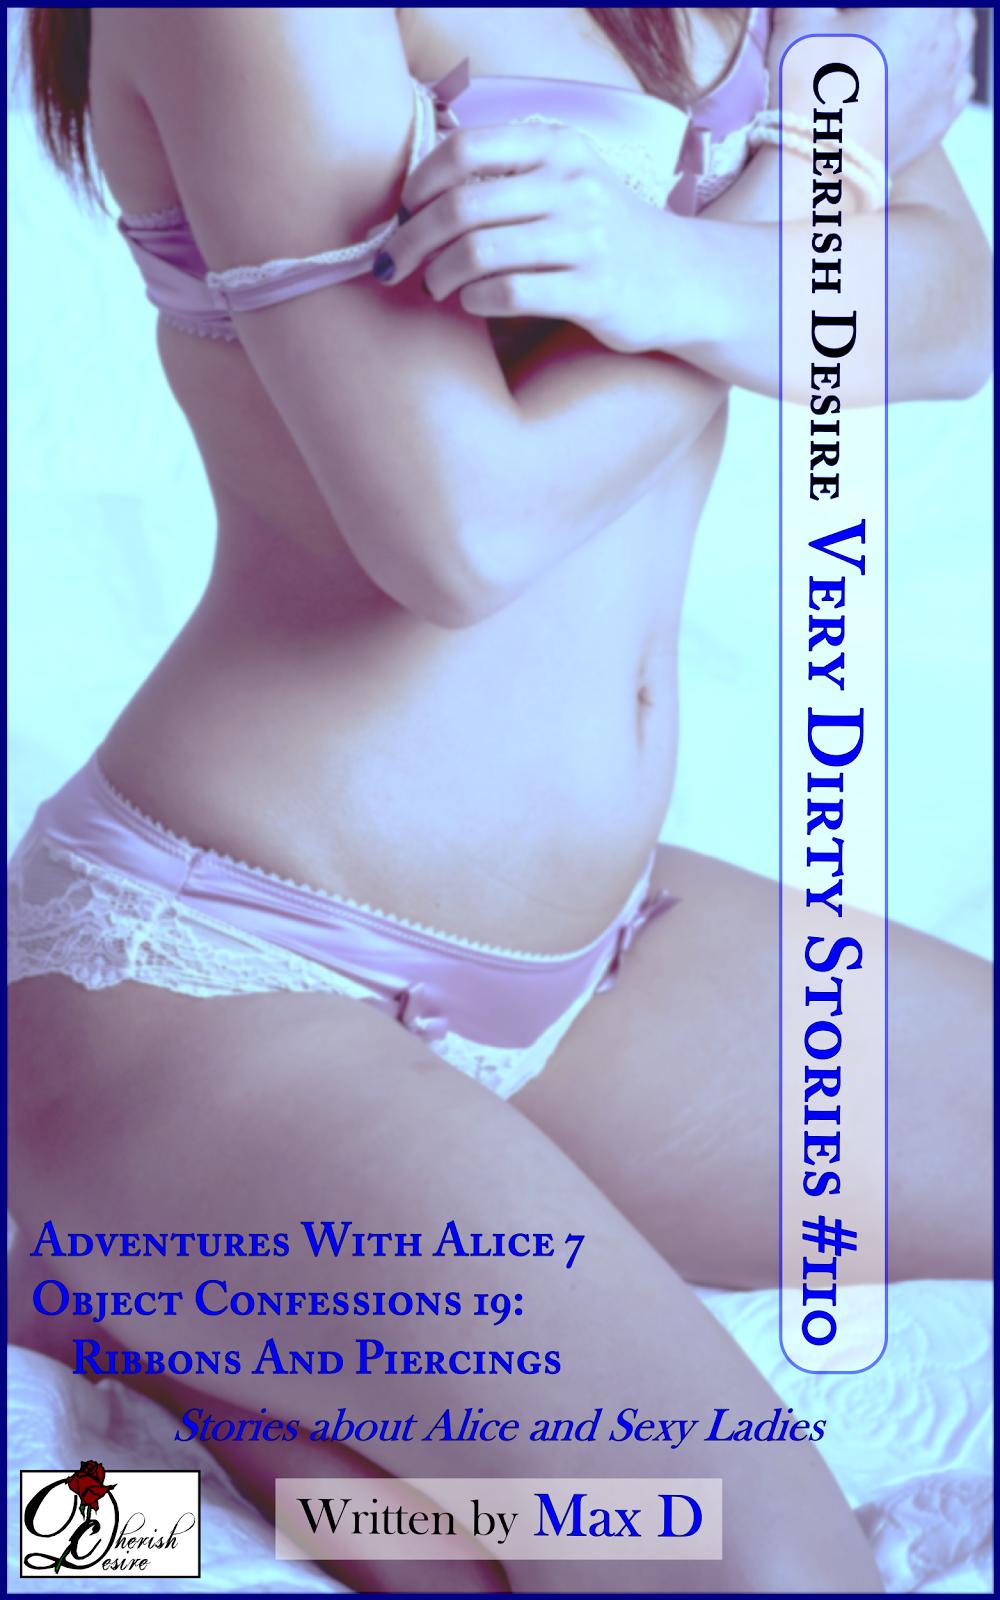 Cherish Desire: Very Dirty Stories #110, Max D, erotica